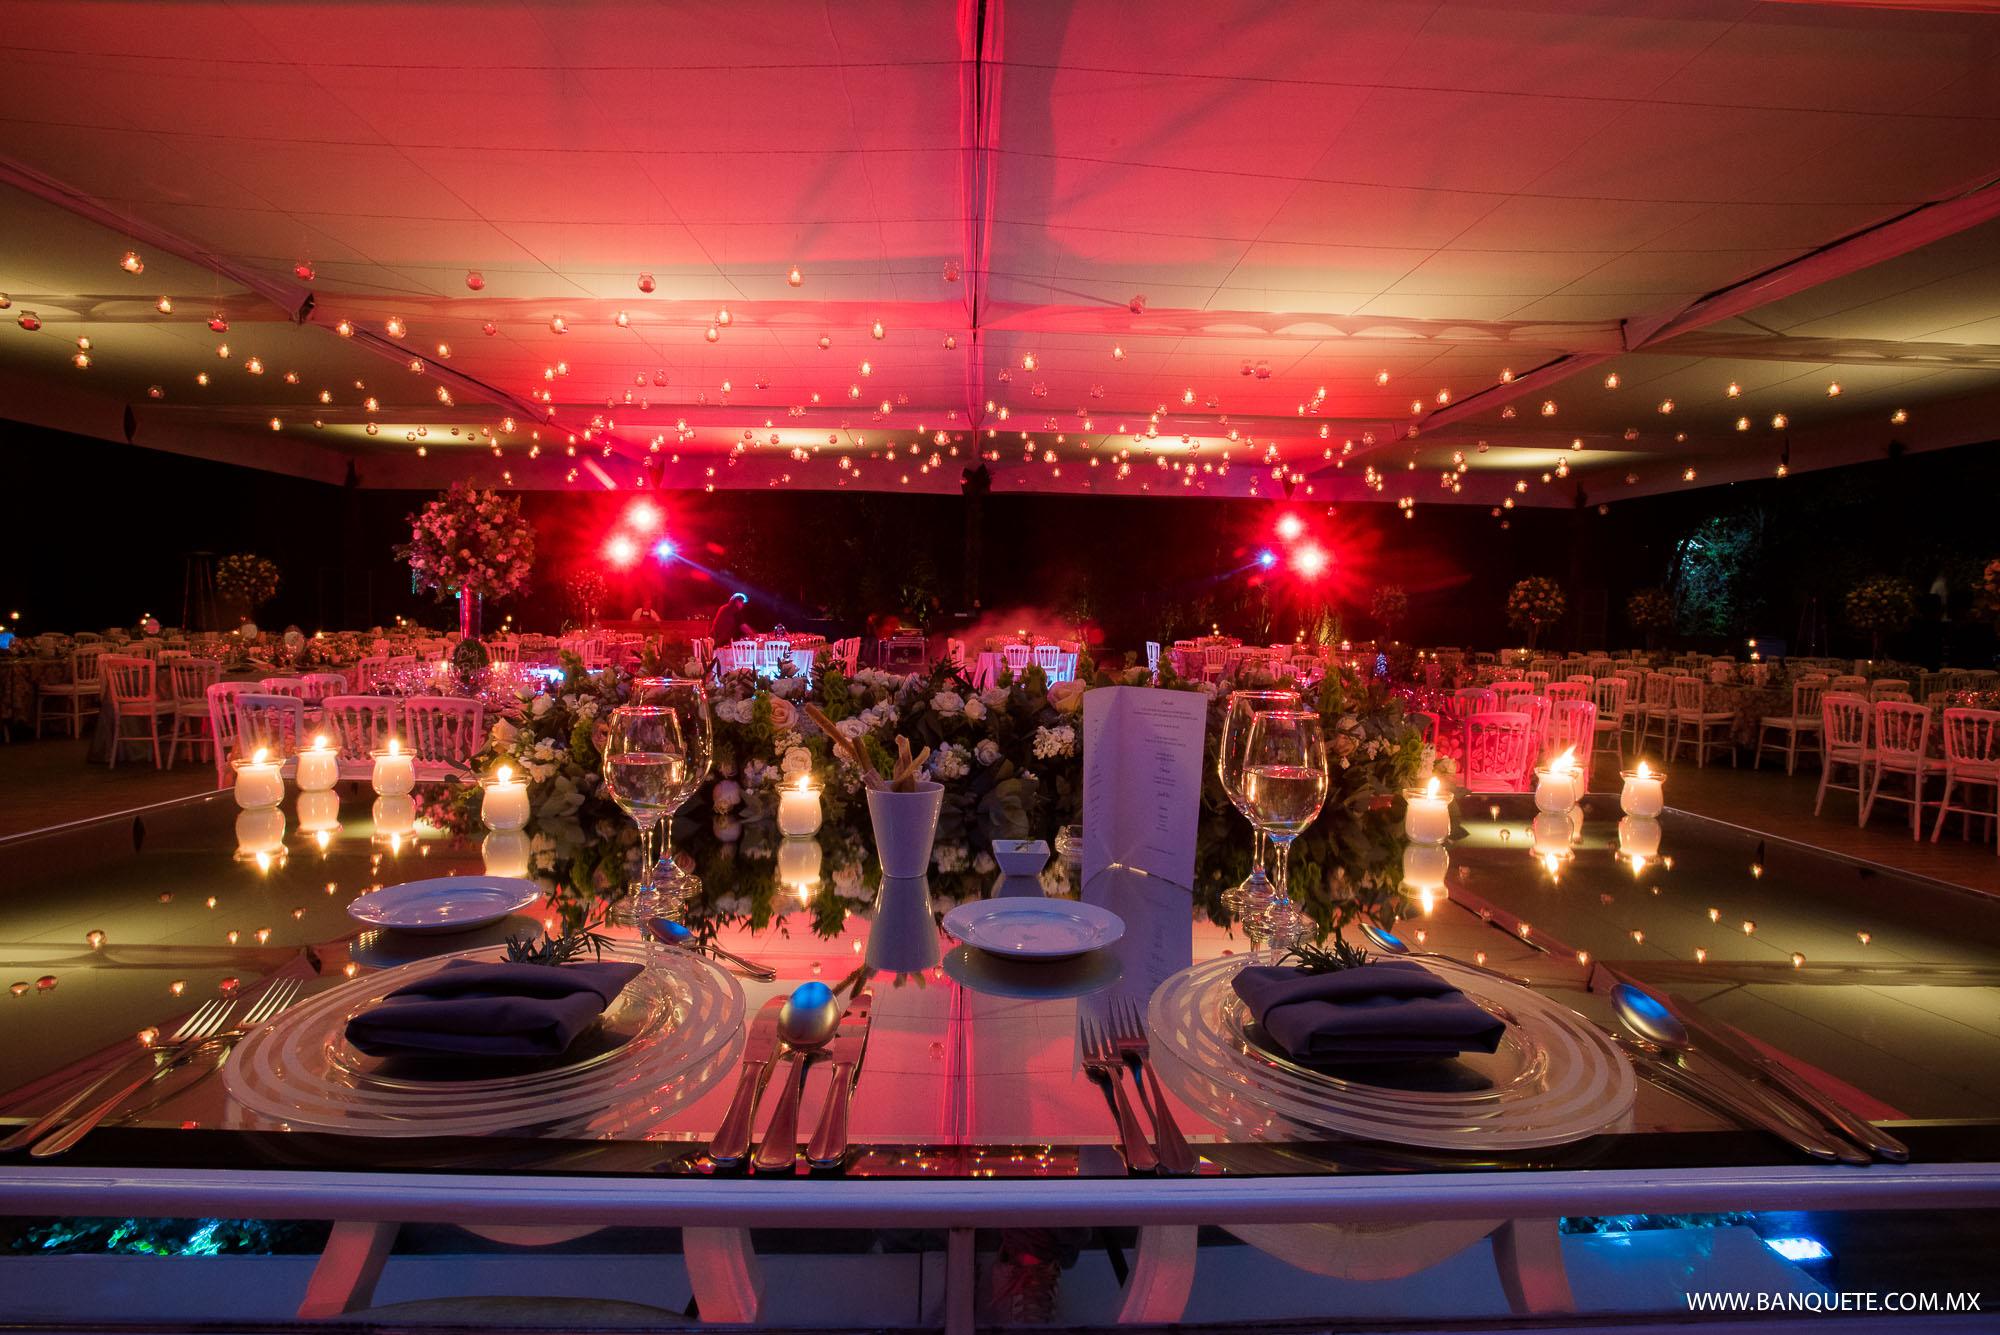 Banquetes Banquete CDMX